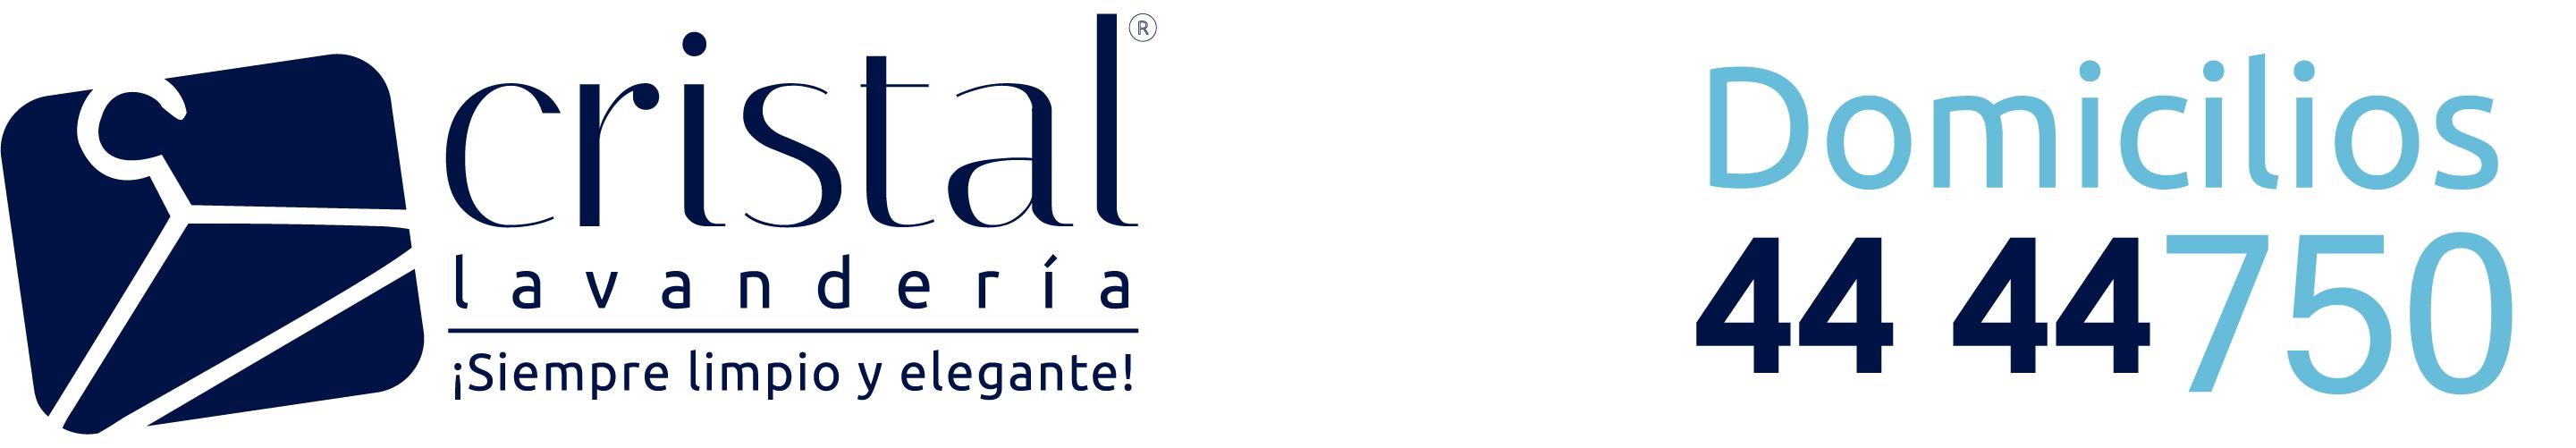 logo-lavanderia-cristal--01